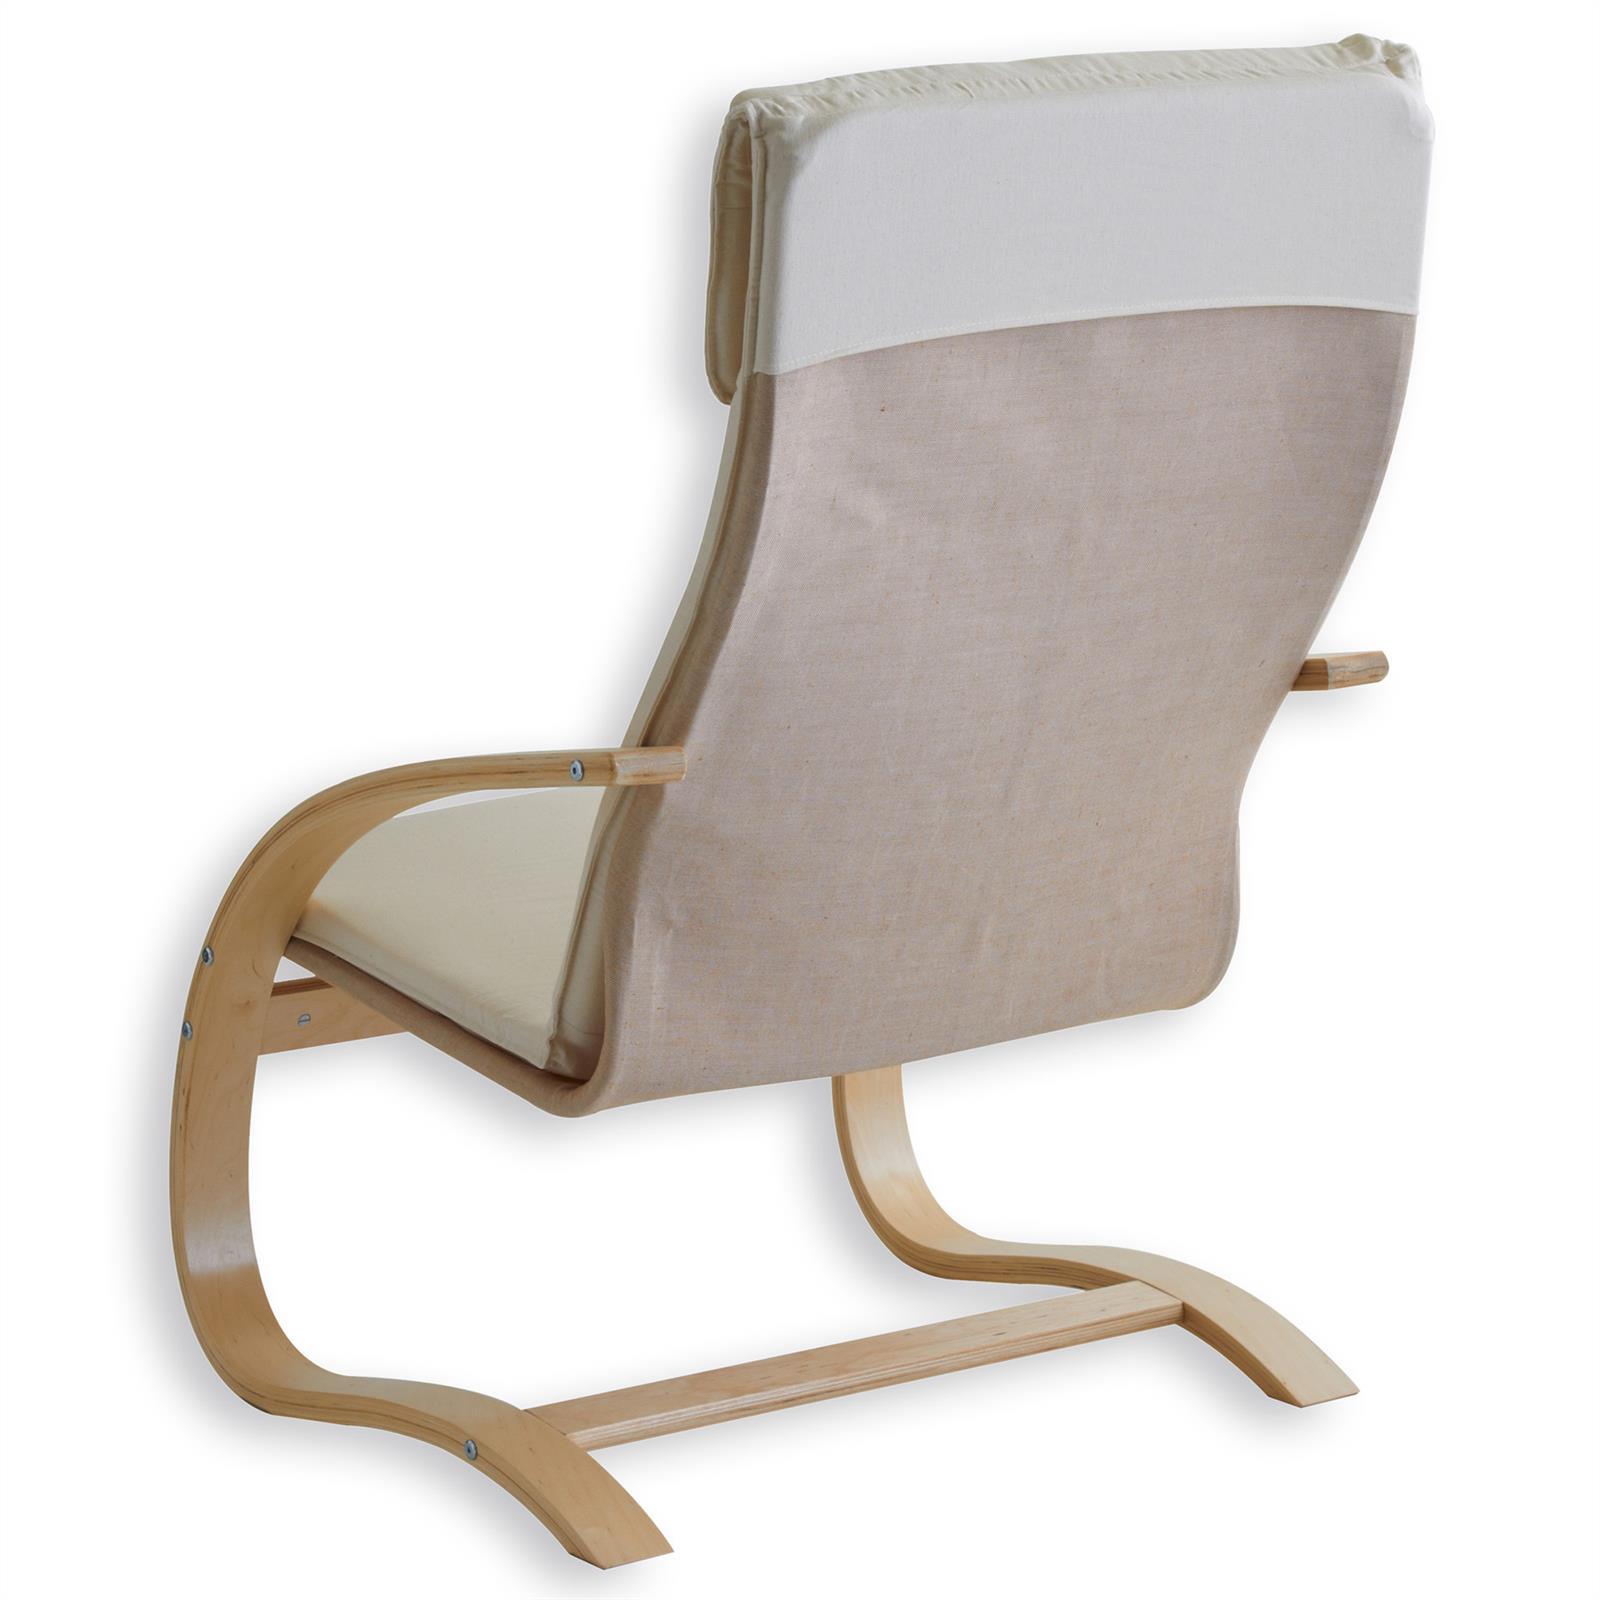 Fauteuil de relaxation anna beige mobil meubles - Fauteuil relax beige ...